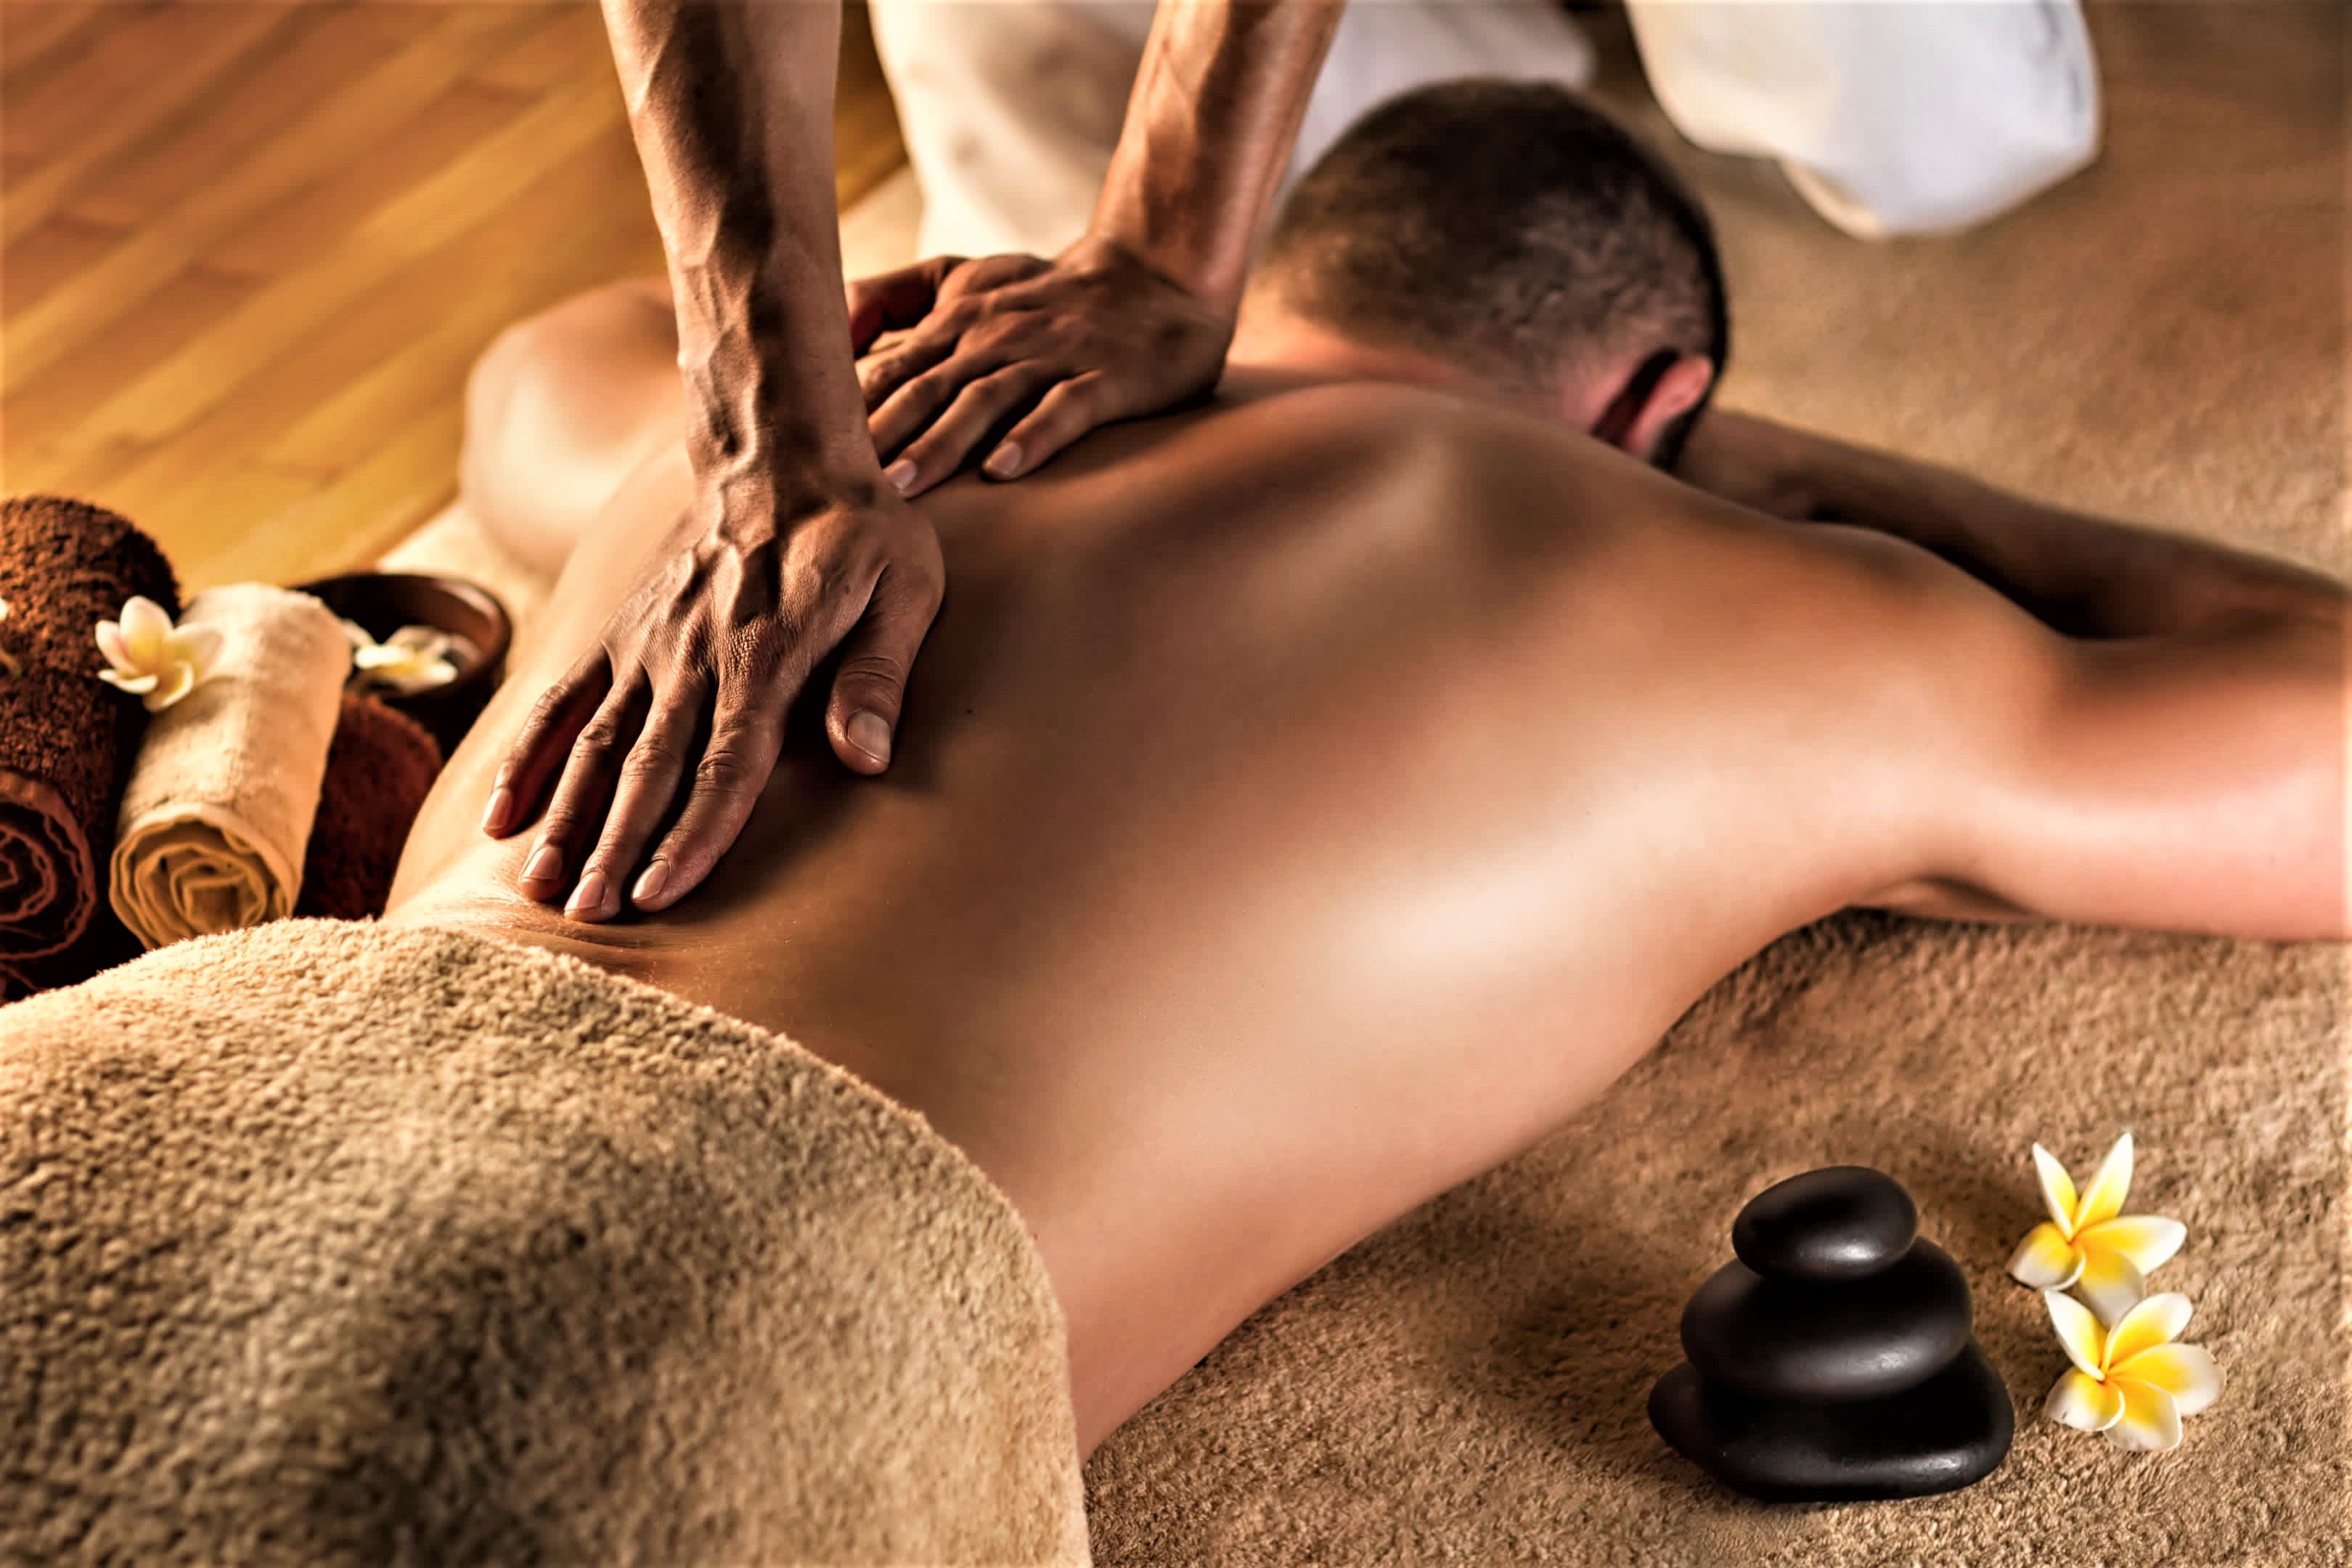 Тандем массаж в 4 руки